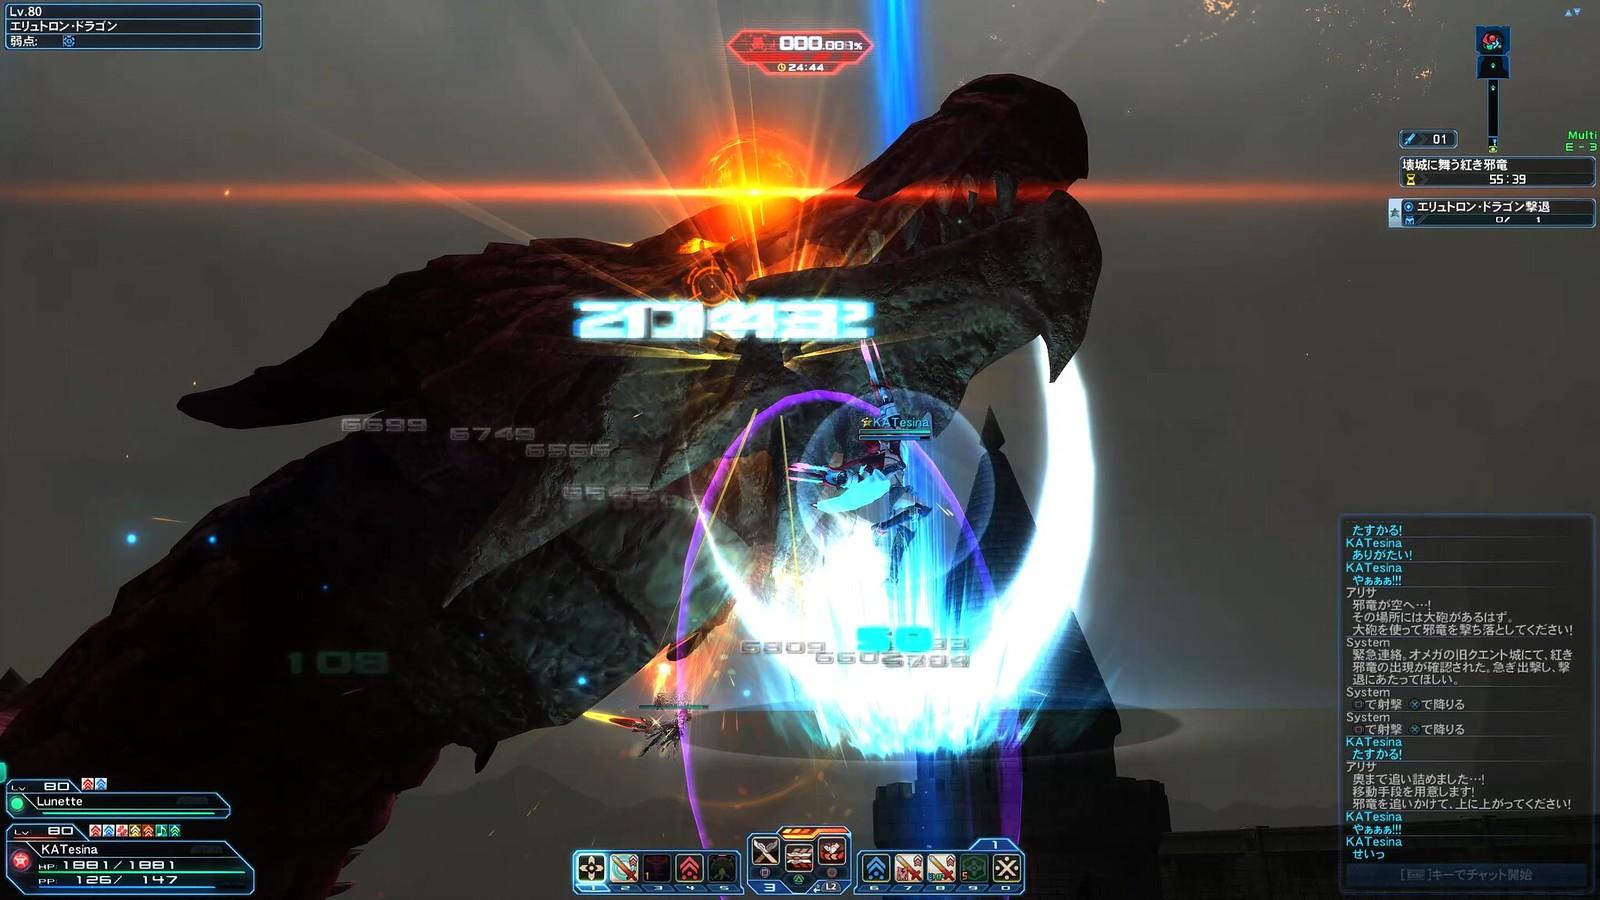 Phantasy Star Online 2 12.30.2017 - 22.30.53.01.mp4_snapshot_04.20_[2017.12.30_23.08.50]